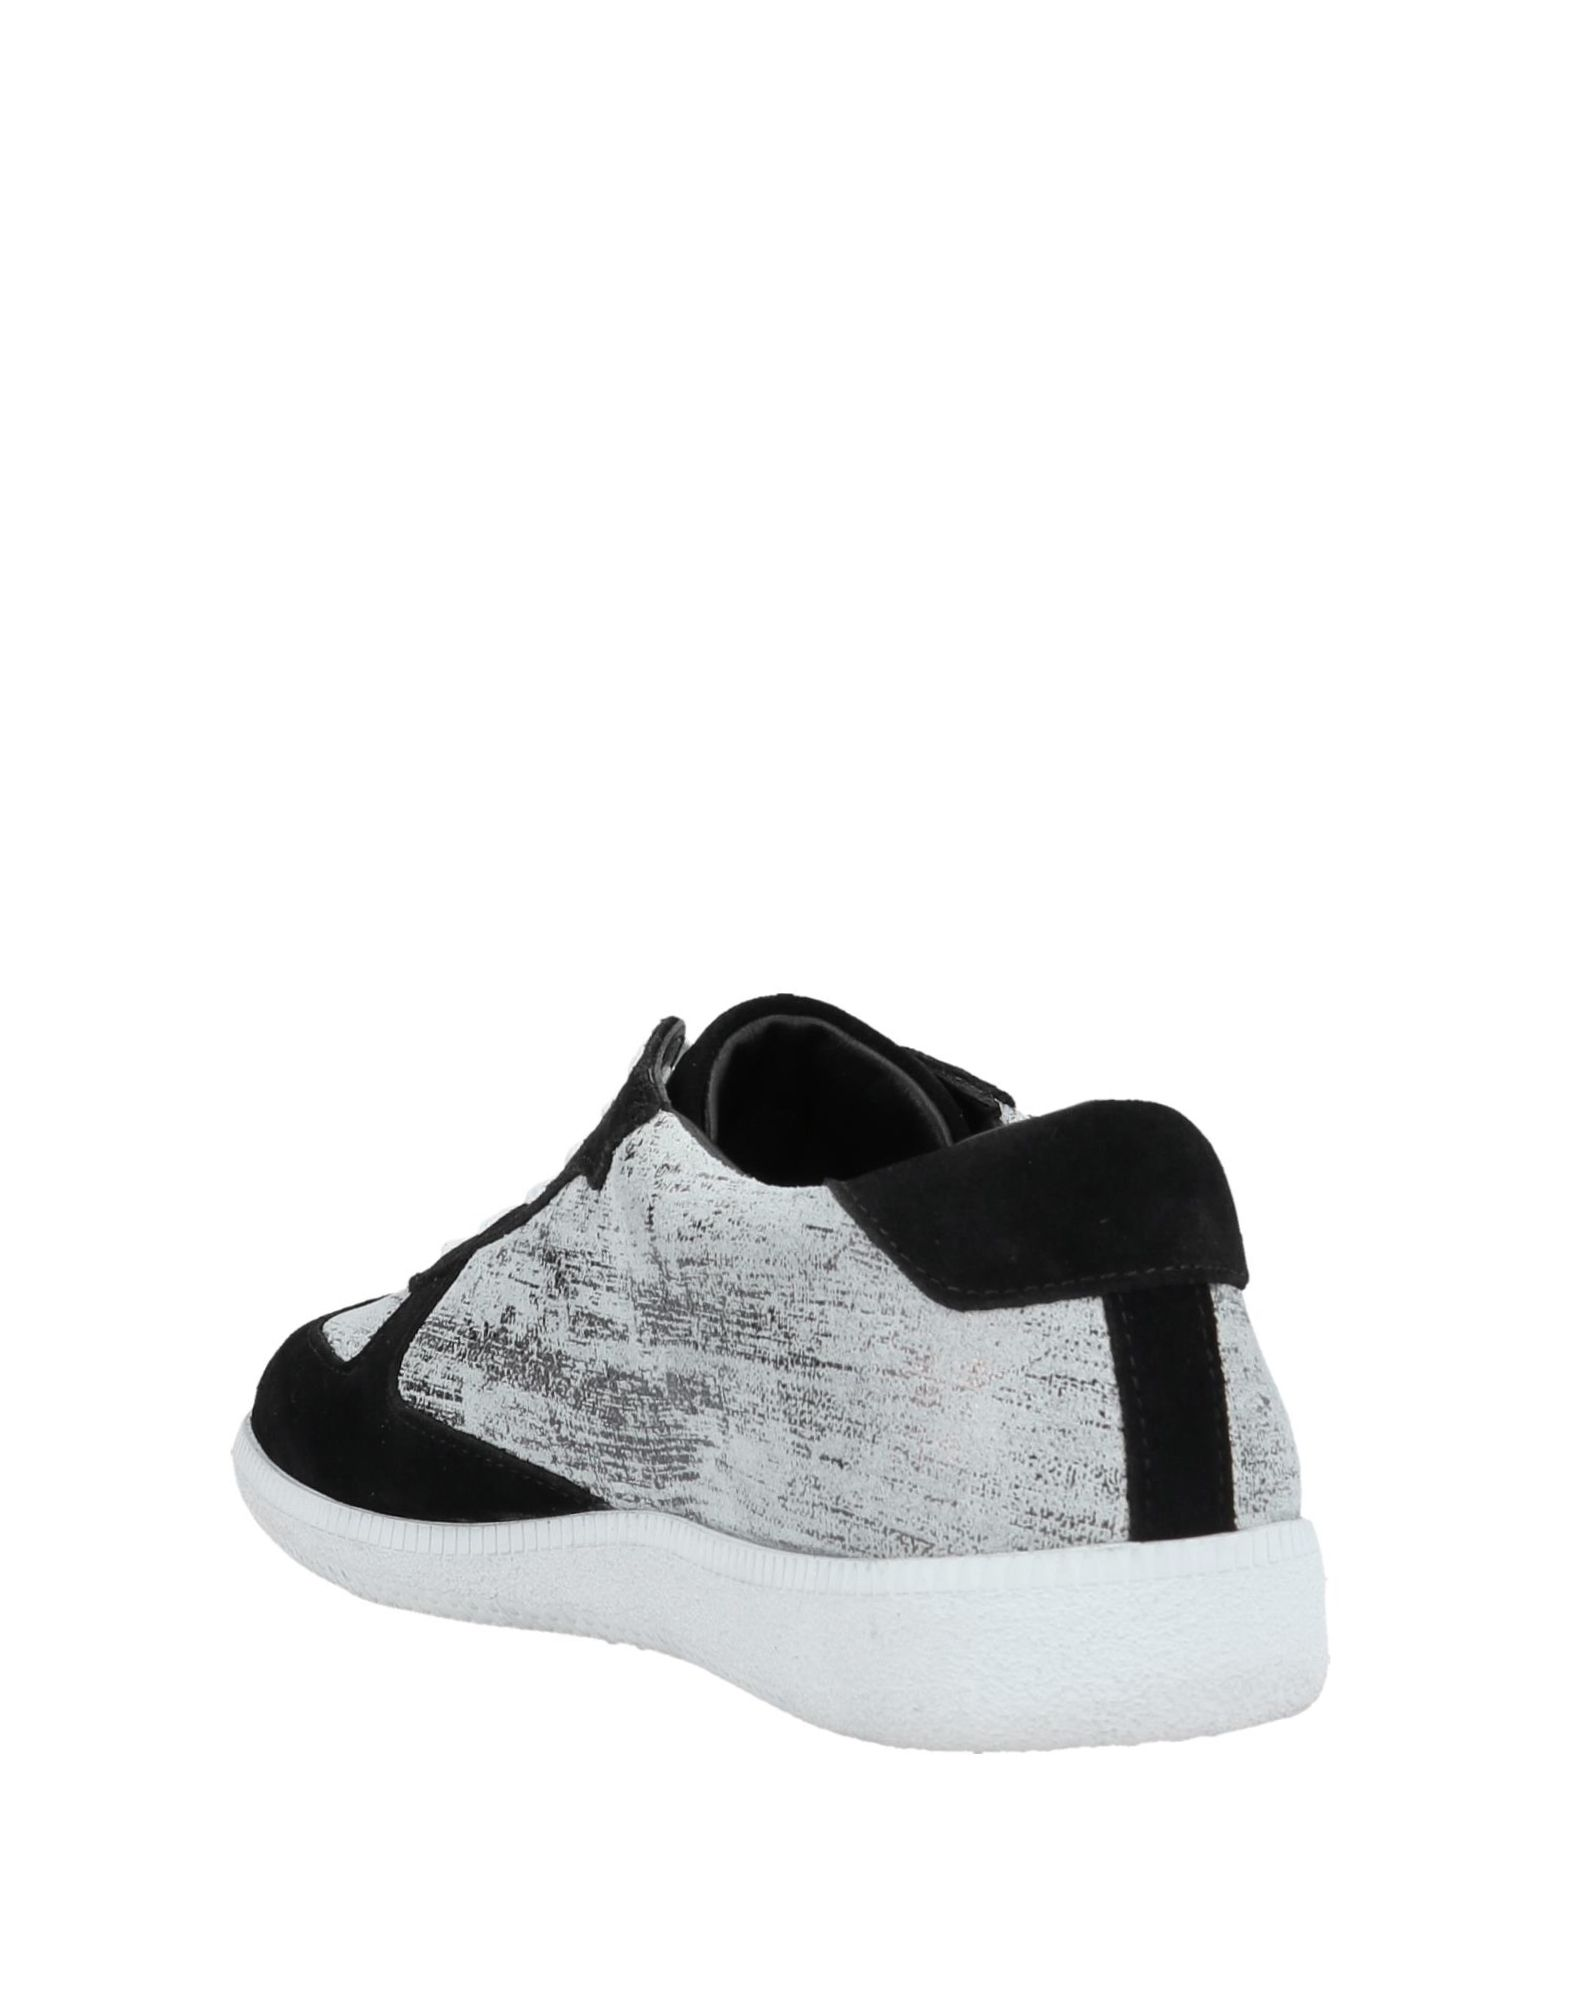 Just Cavalli Sneakers - Men Just Cavalli Canada Sneakers online on  Canada Cavalli - 11570904MJ a09cc7